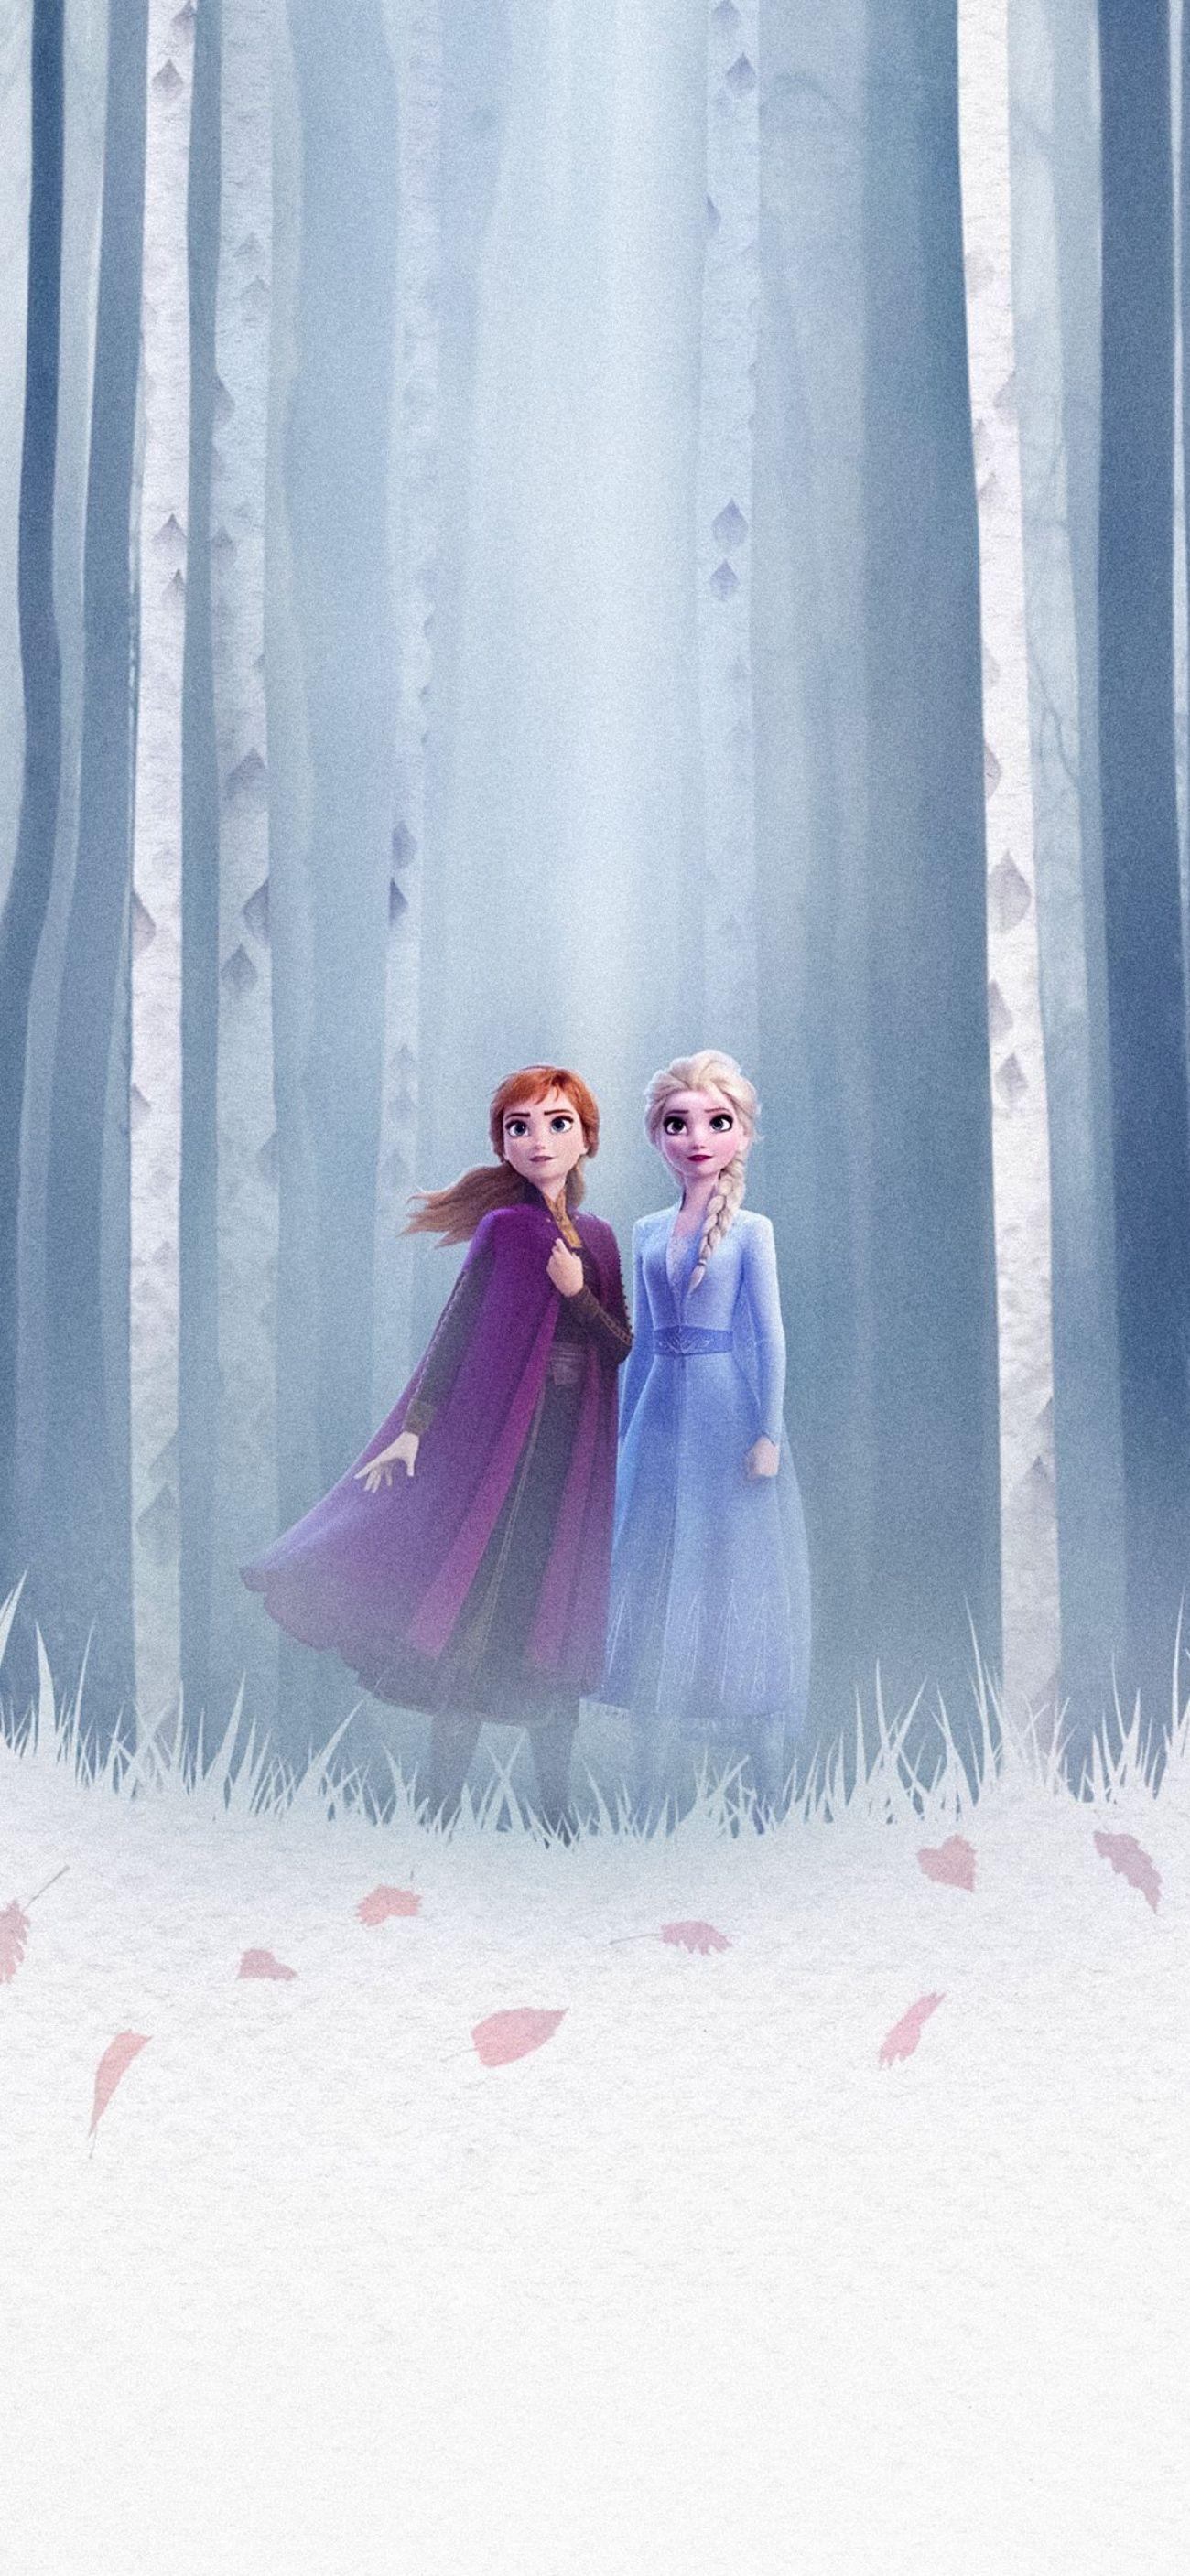 Frozen 2 iPhone Hd Wallpapers - Wallpaper Cave